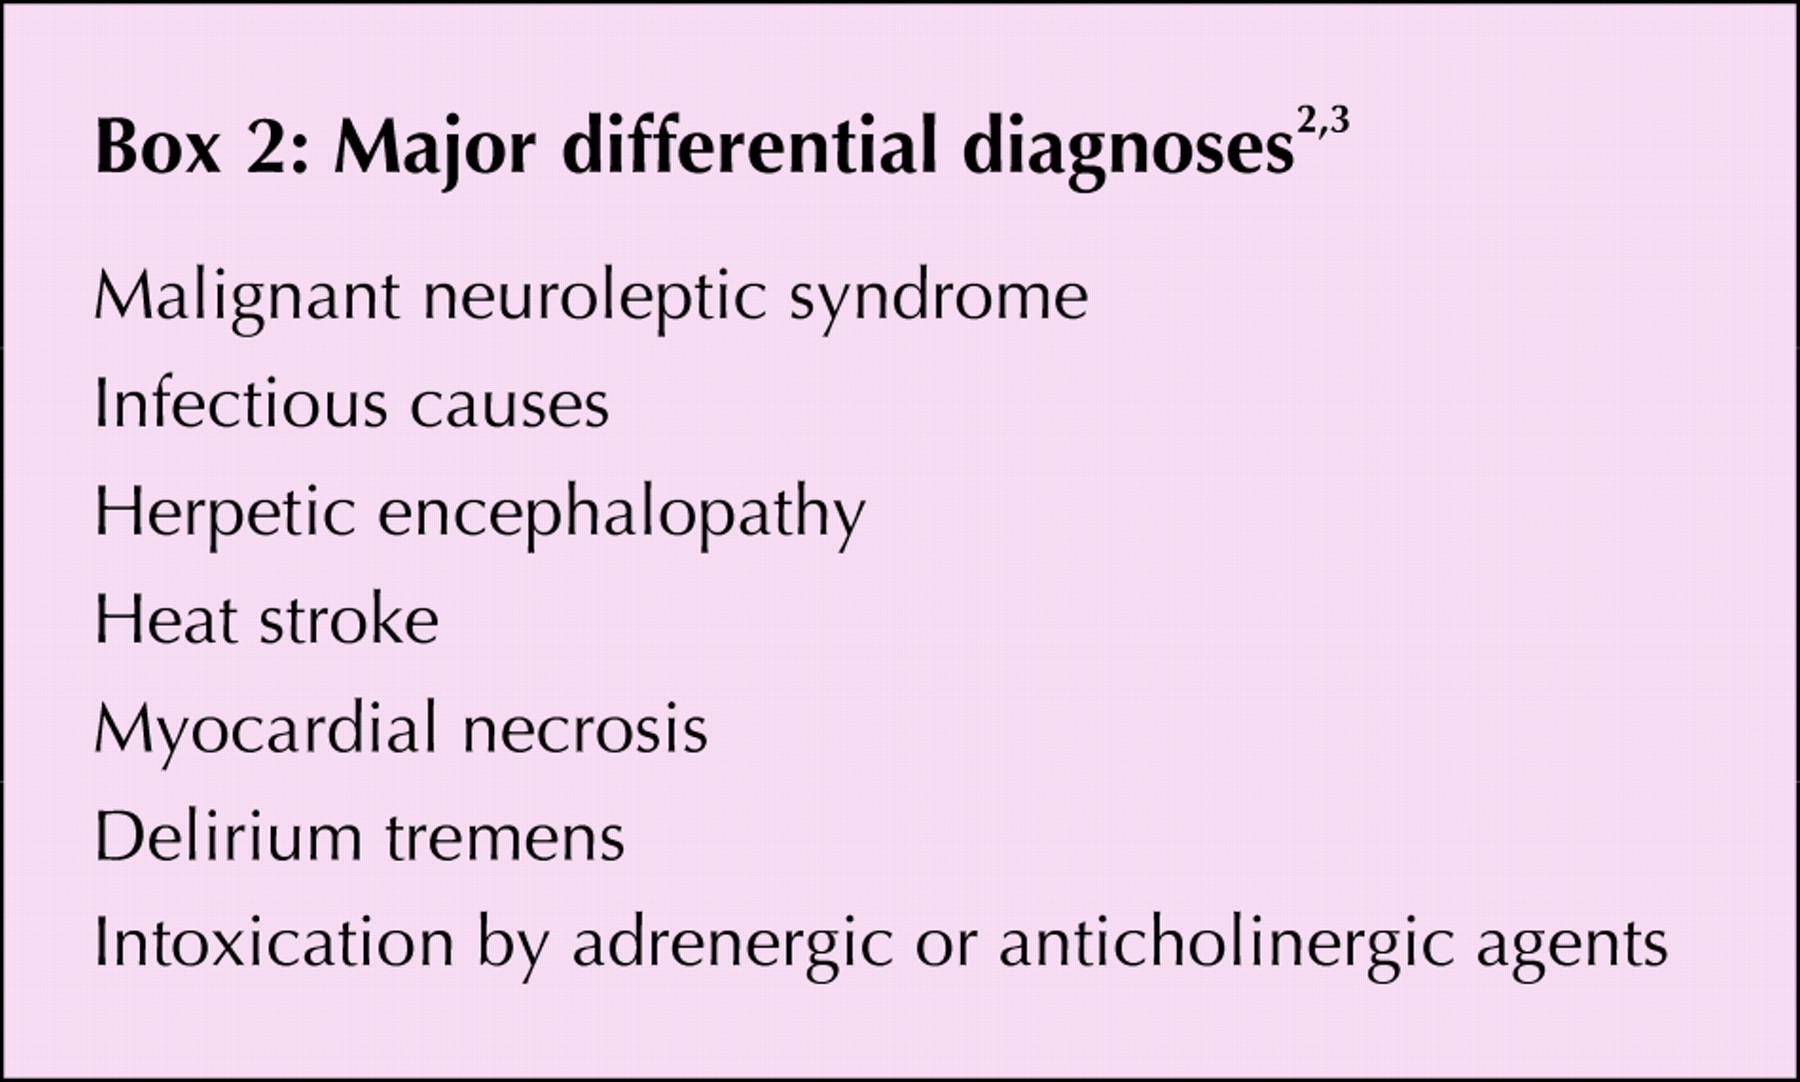 Serotonin syndrome: a brief review | CMAJ